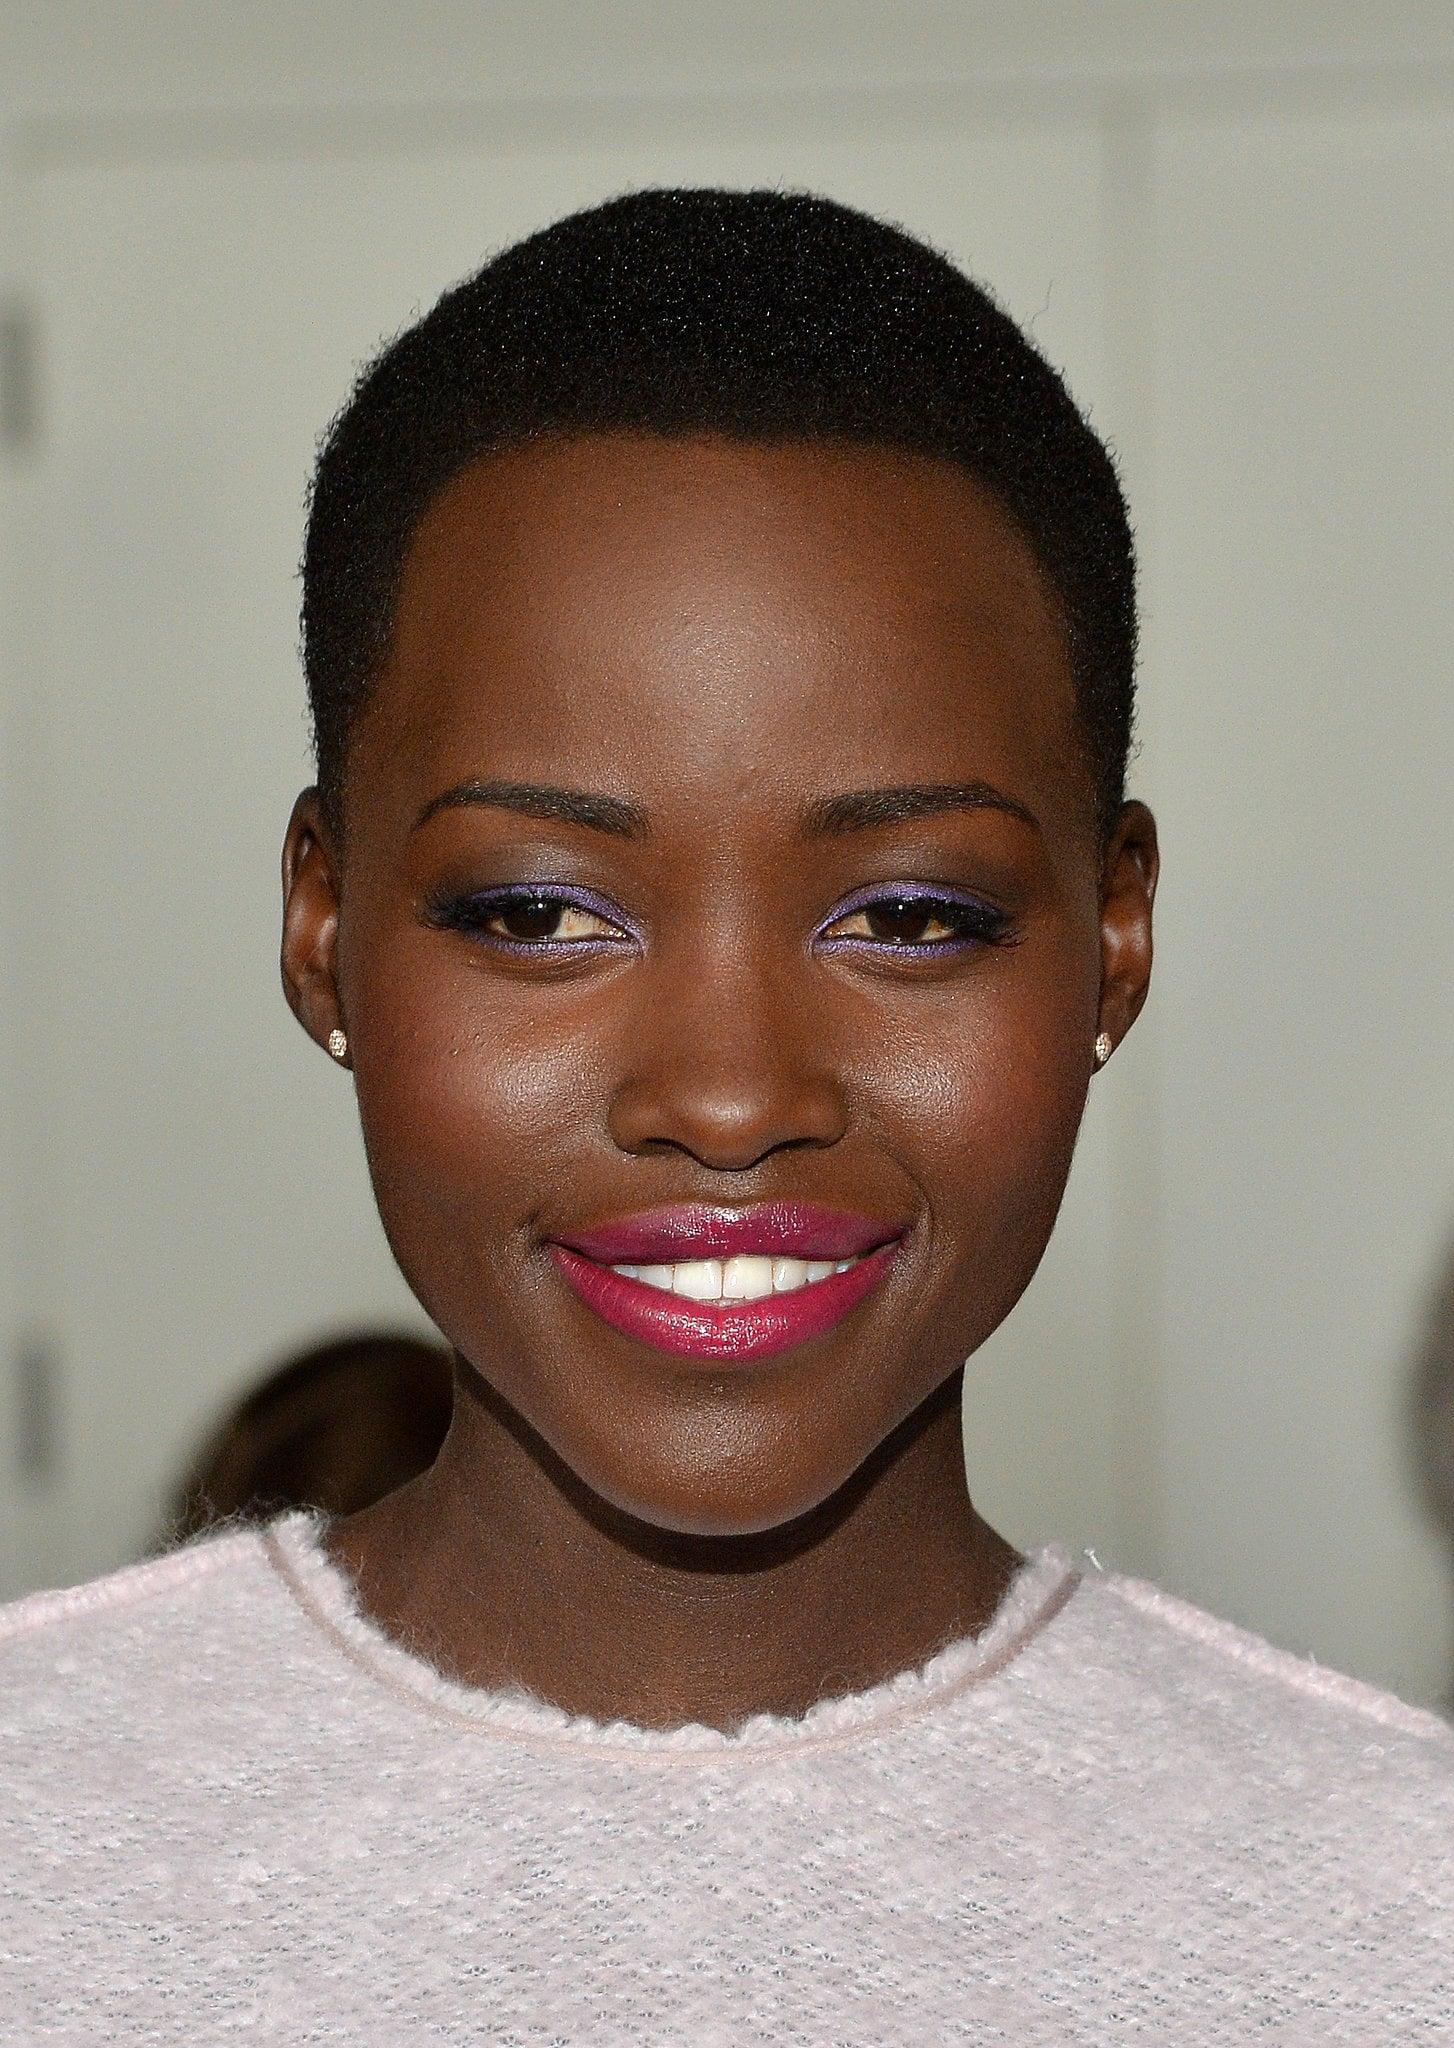 Lupita Nyong'o's Makeup